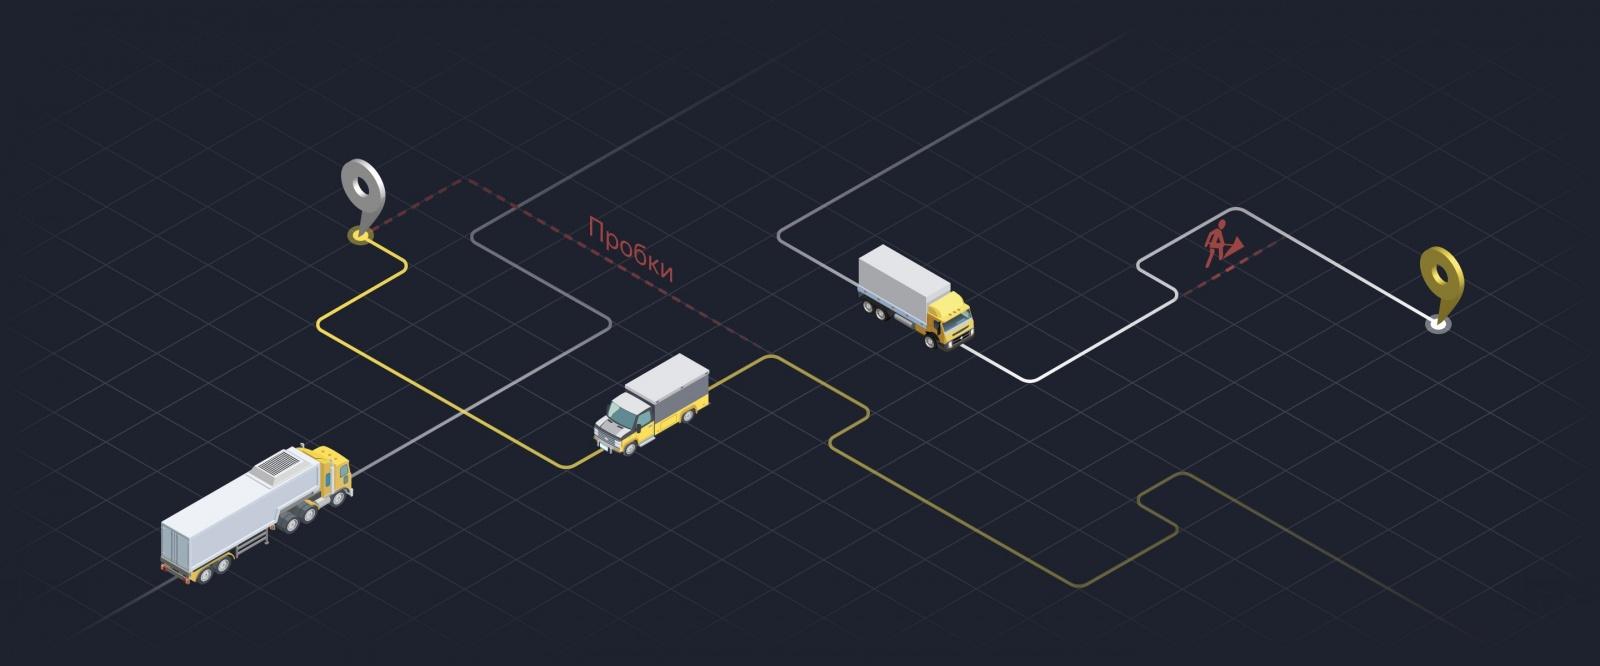 Сотни тысяч маршрутов в секунду на ядро. Опыт Яндекс.Маршрутизации - 1